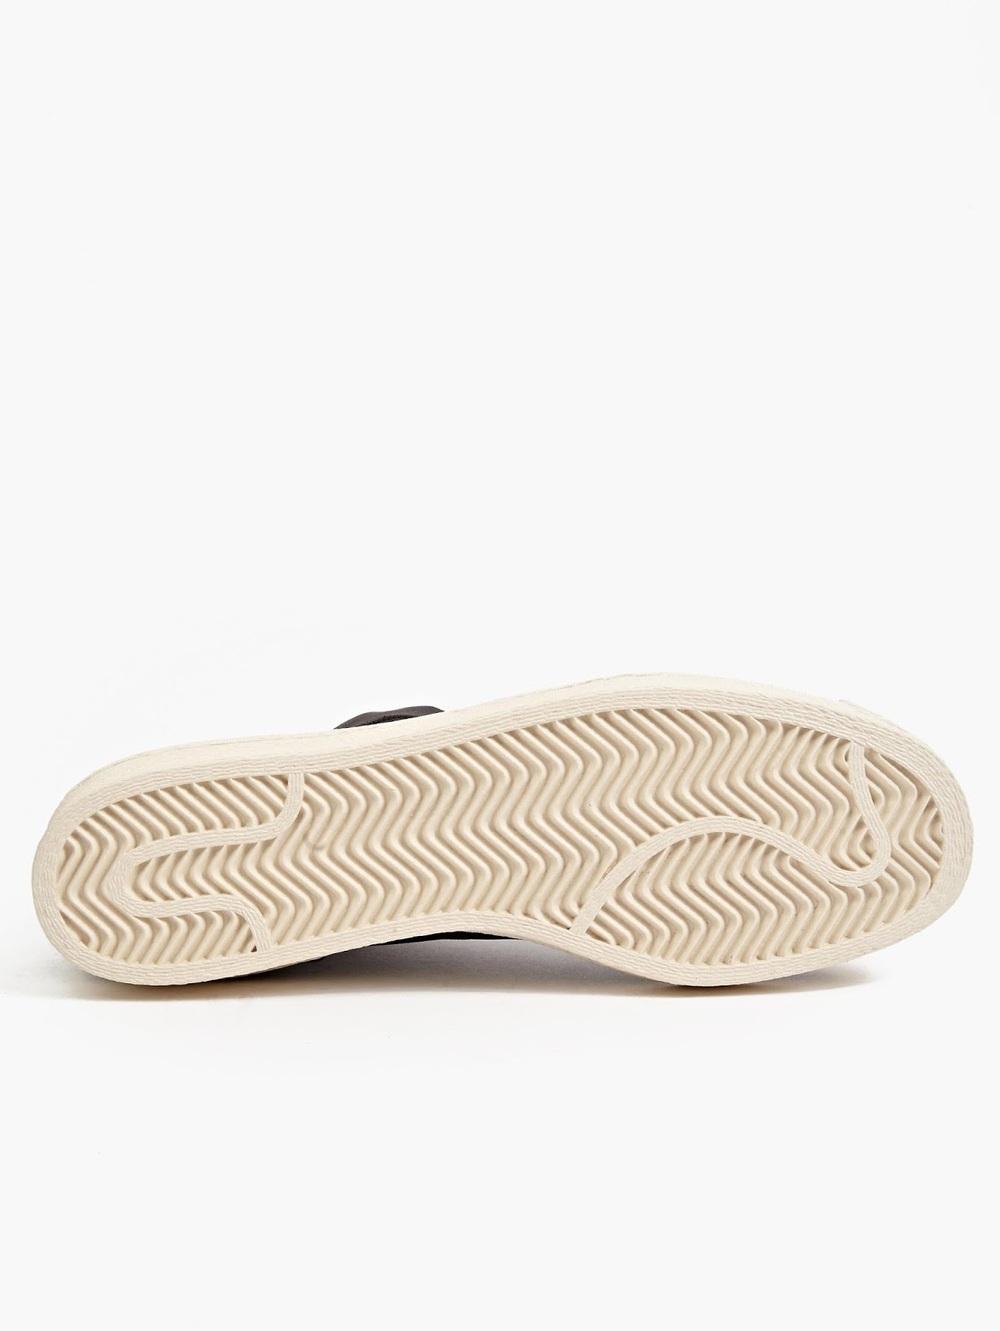 adidas-rick-owens-minimalist-edgy-sneakers9.jpg